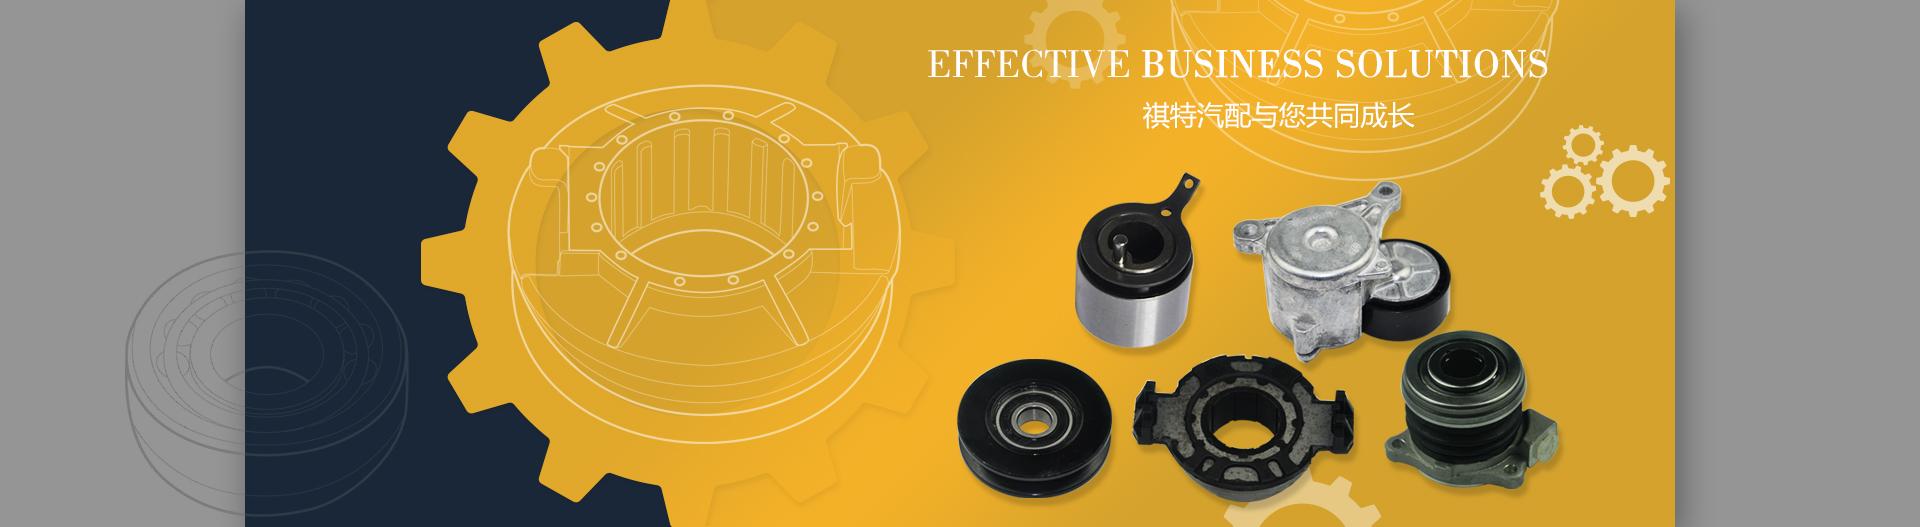 JIANGSU QITE AUTOMOBILE PARTS CO.,LTD生产:Automotive bearing,hydraulic bearing,clutch release bearing,tensioner